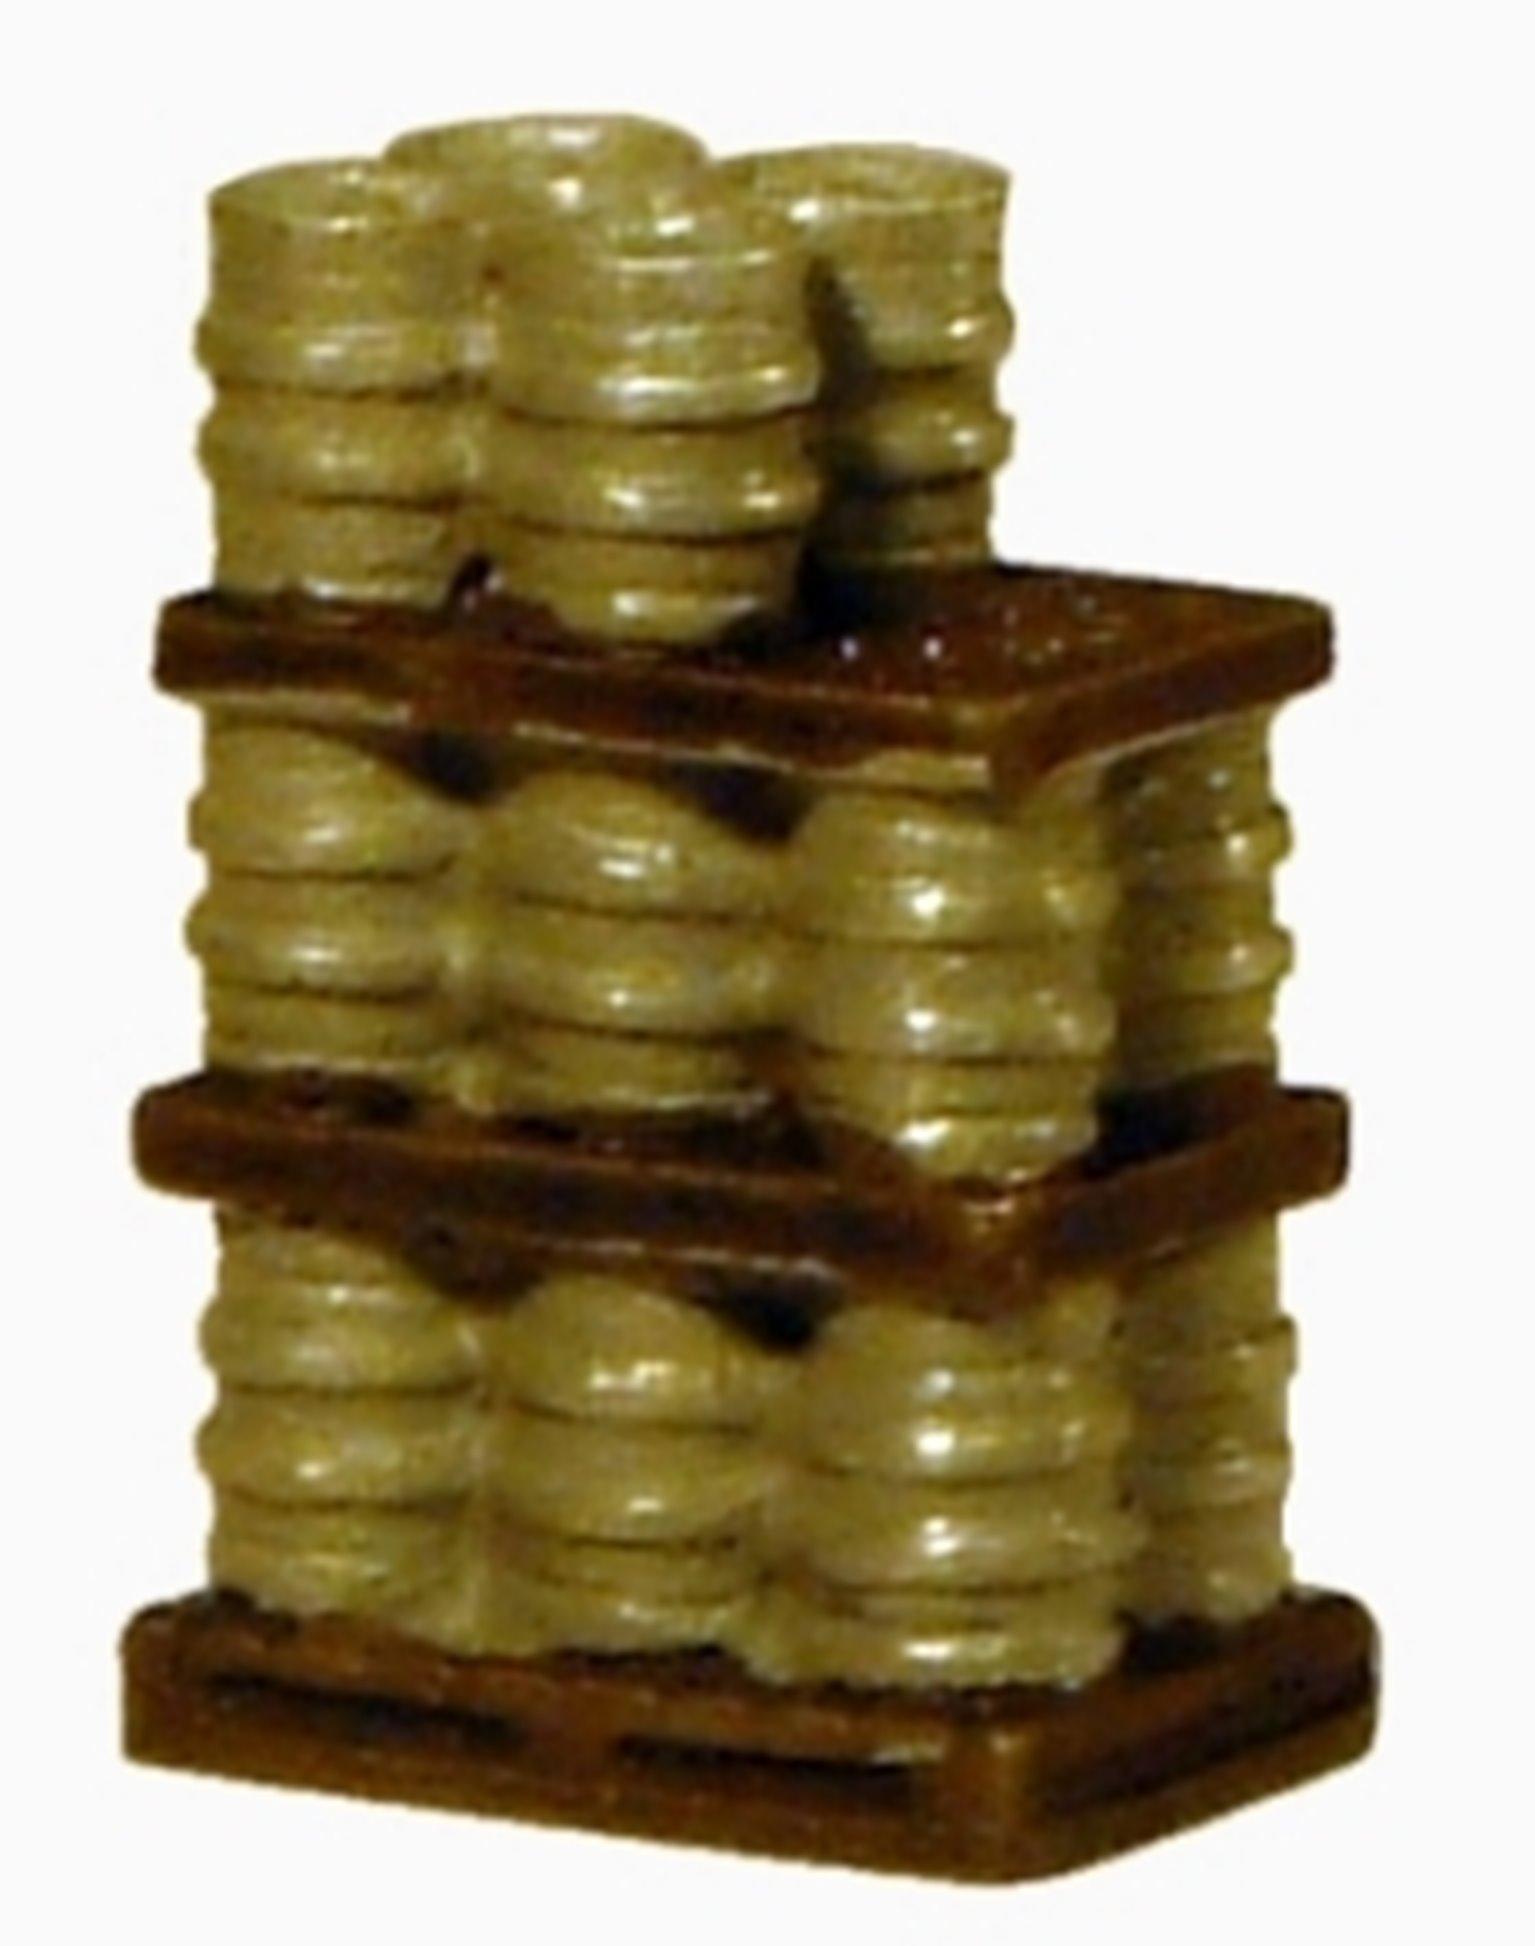 Alloy kegs on pallet - 3 tier part load